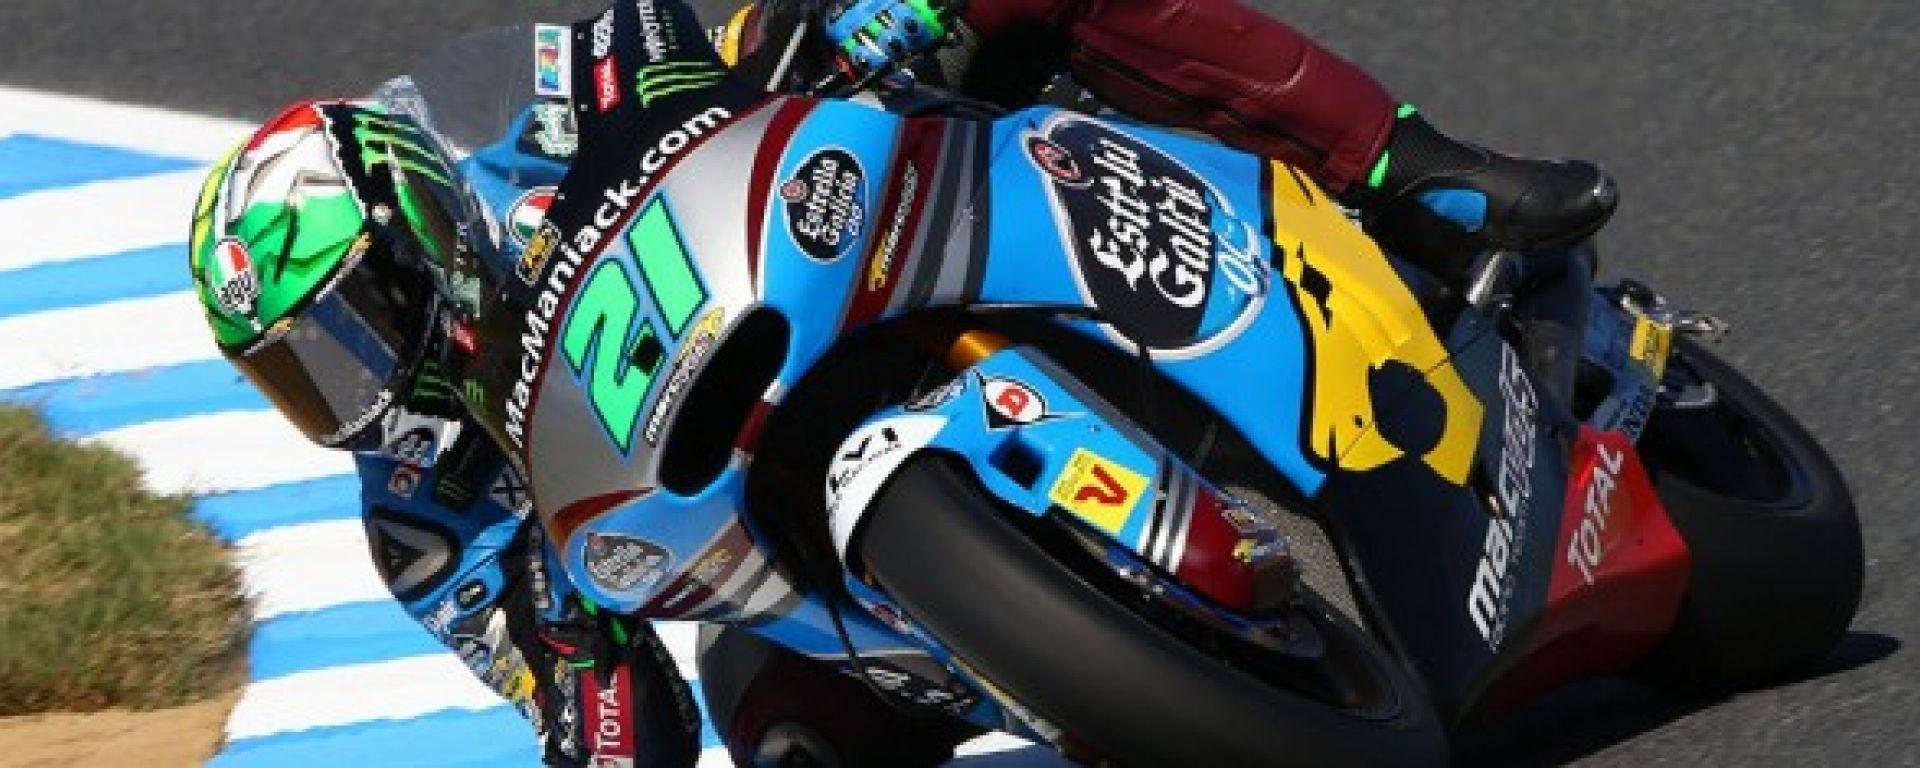 Moto2 2016: a Motegi vince Luthi, Morbidelli sul podio